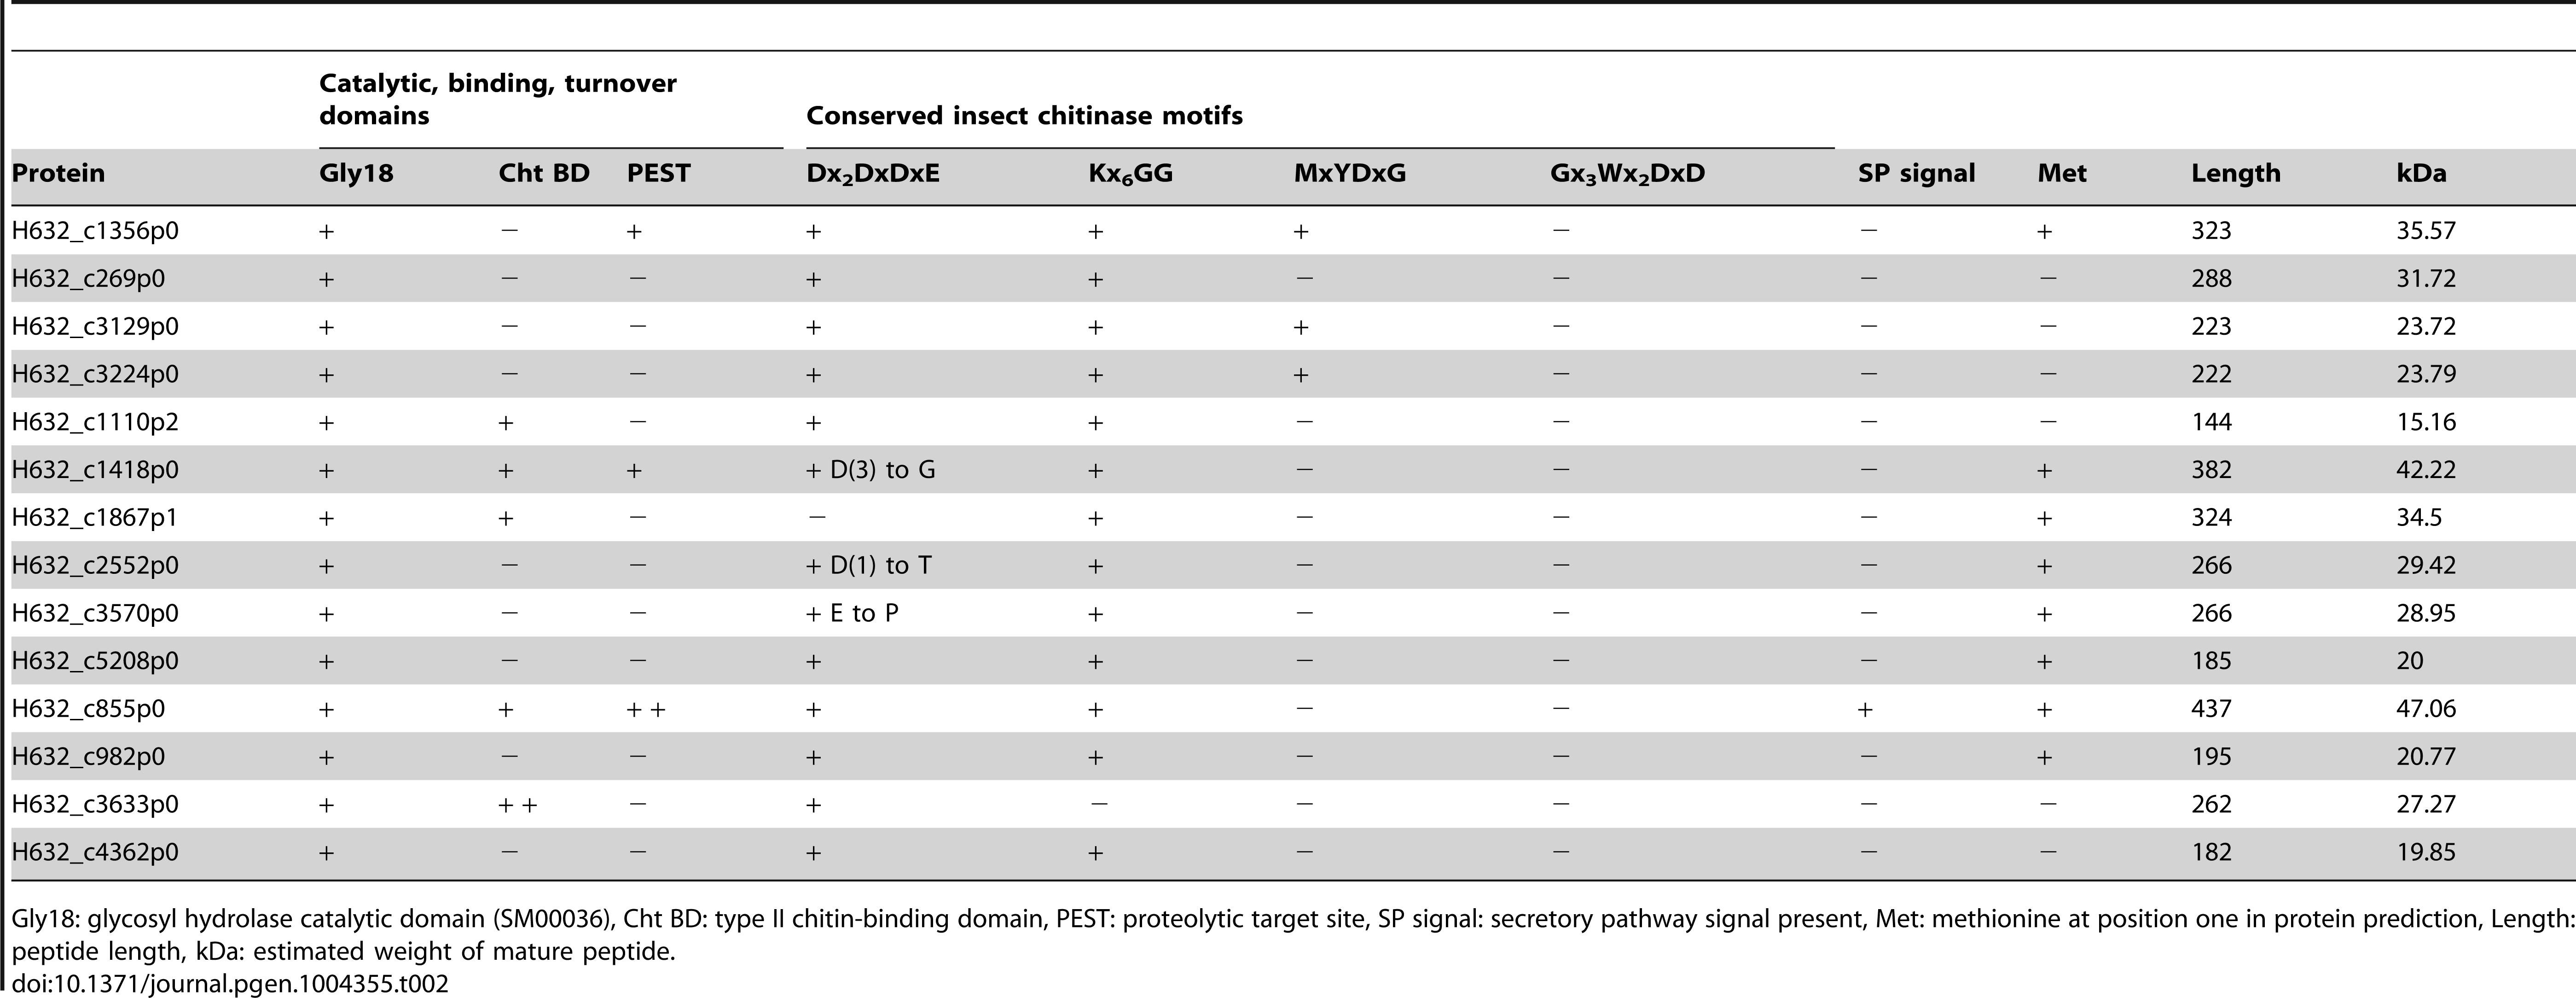 Summary statistics for predicted chitinase proteins in <i>Helicosporidium</i> genome.